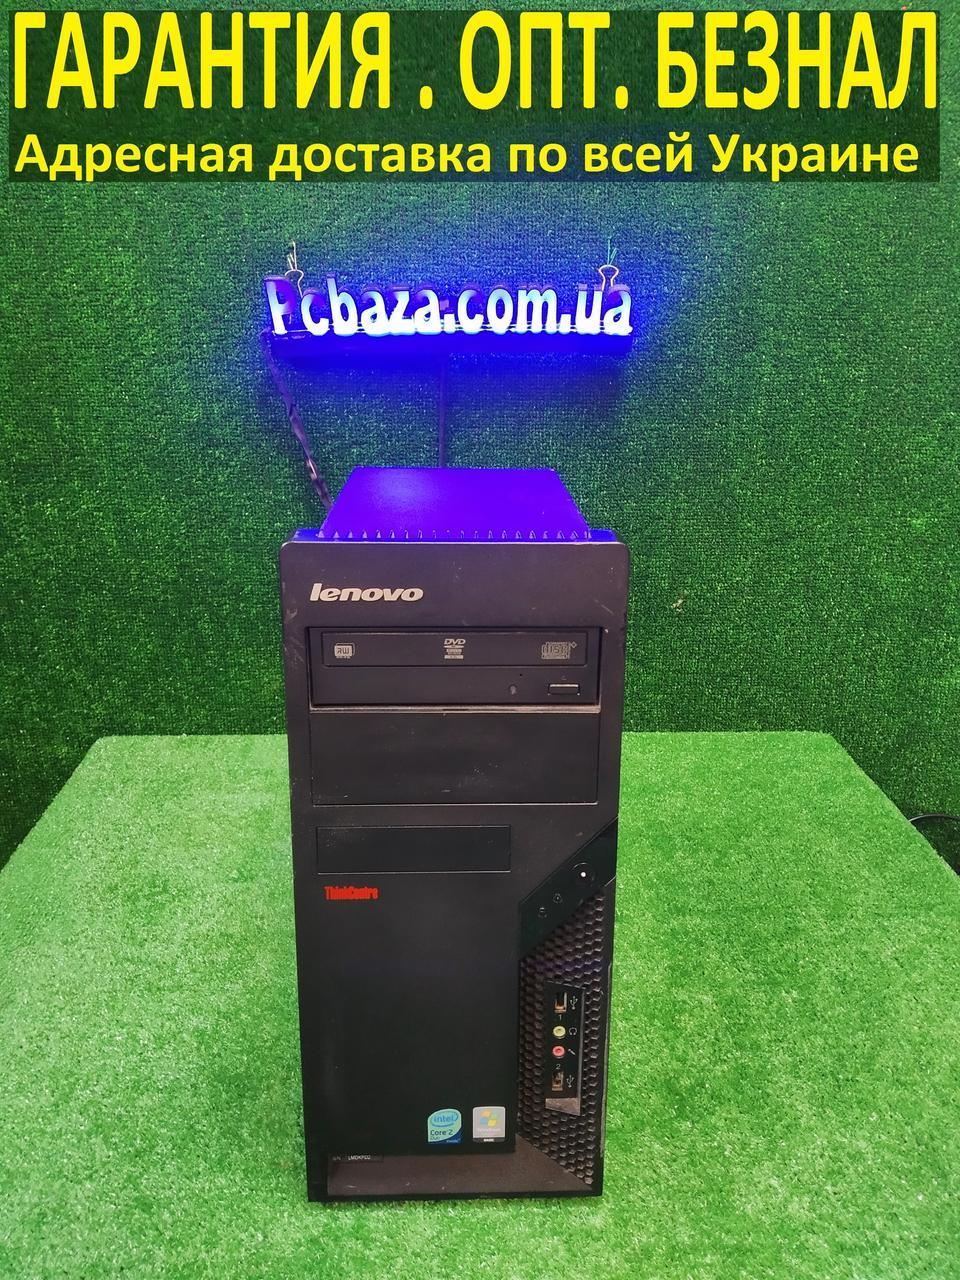 Компьютер Lenovo, 2 ядра Intel, 2 Гб ОЗУ, 80Гб HDD Настроен, подключай и пользуйся!